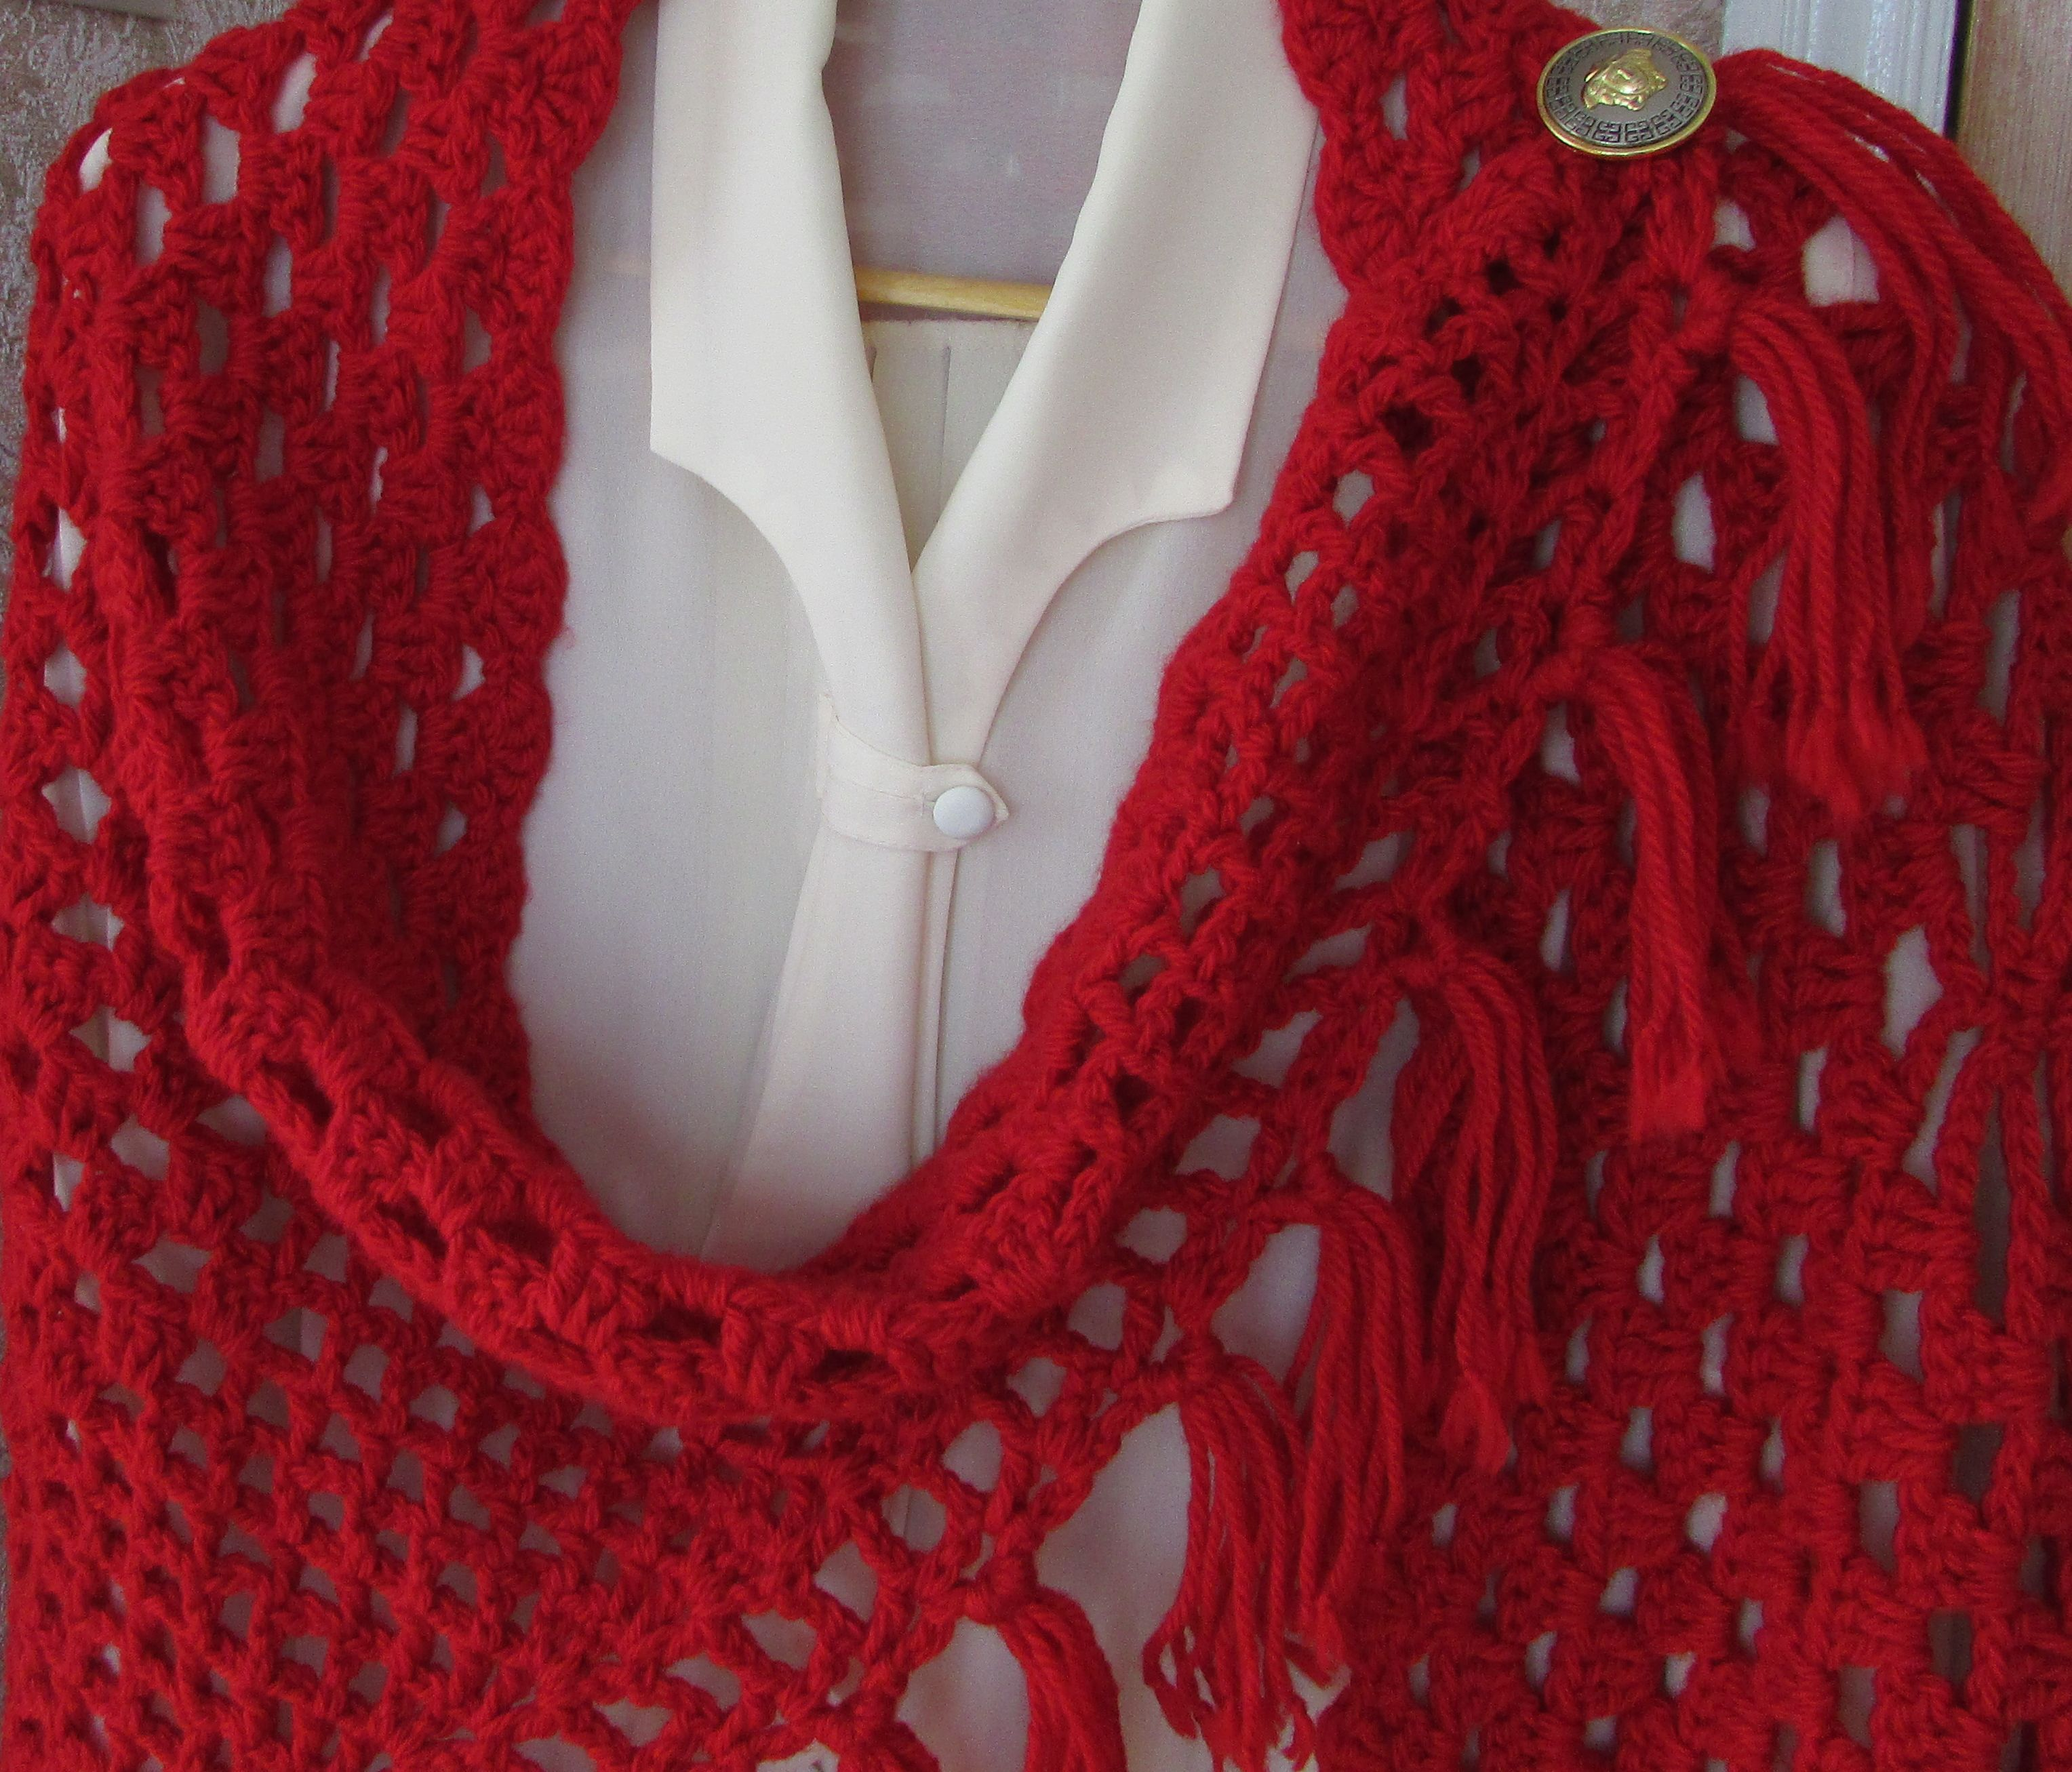 handmade шальаксессуары подарокажурная вязаннаяшаль ручной работышаль крючкомшалишаль шальшаль